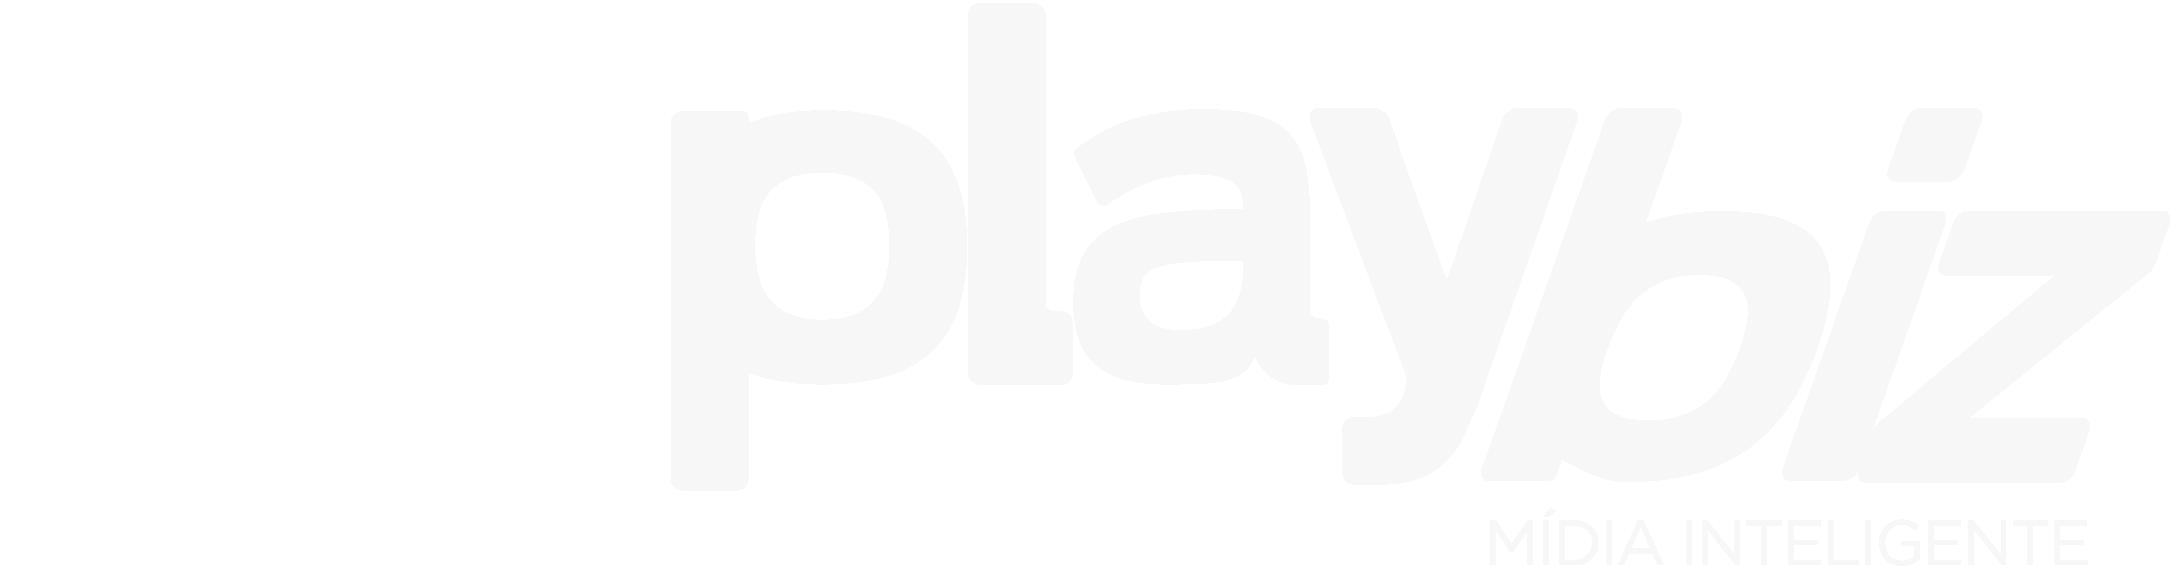 Playbiz